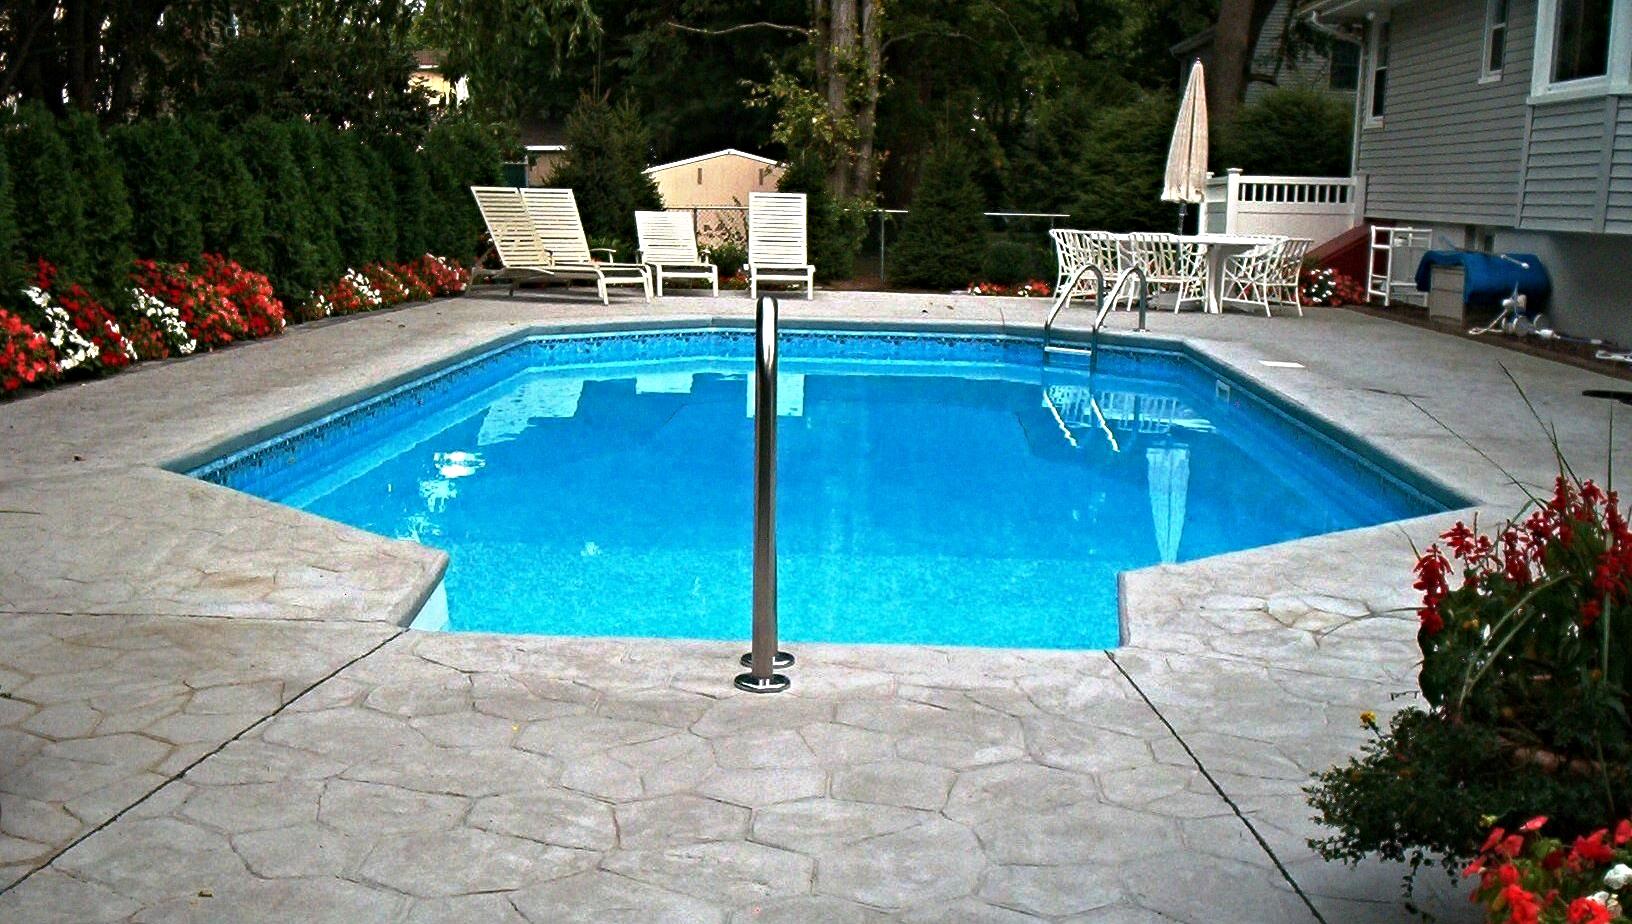 Petrullo pool